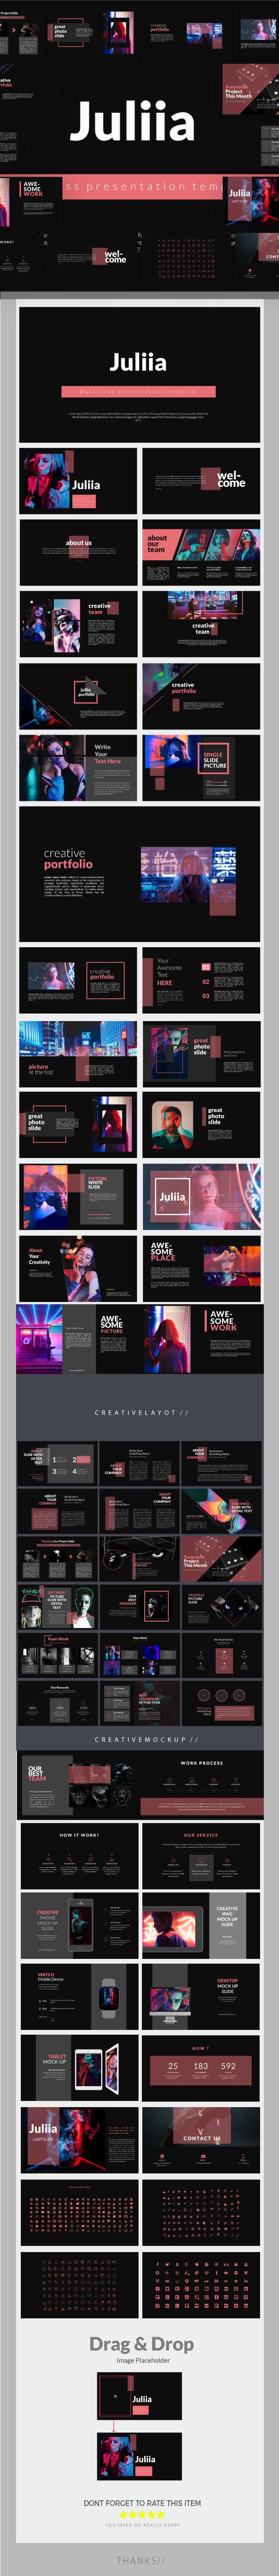 GraphicRiver Juliia Keynote Presentation Templates 21120269